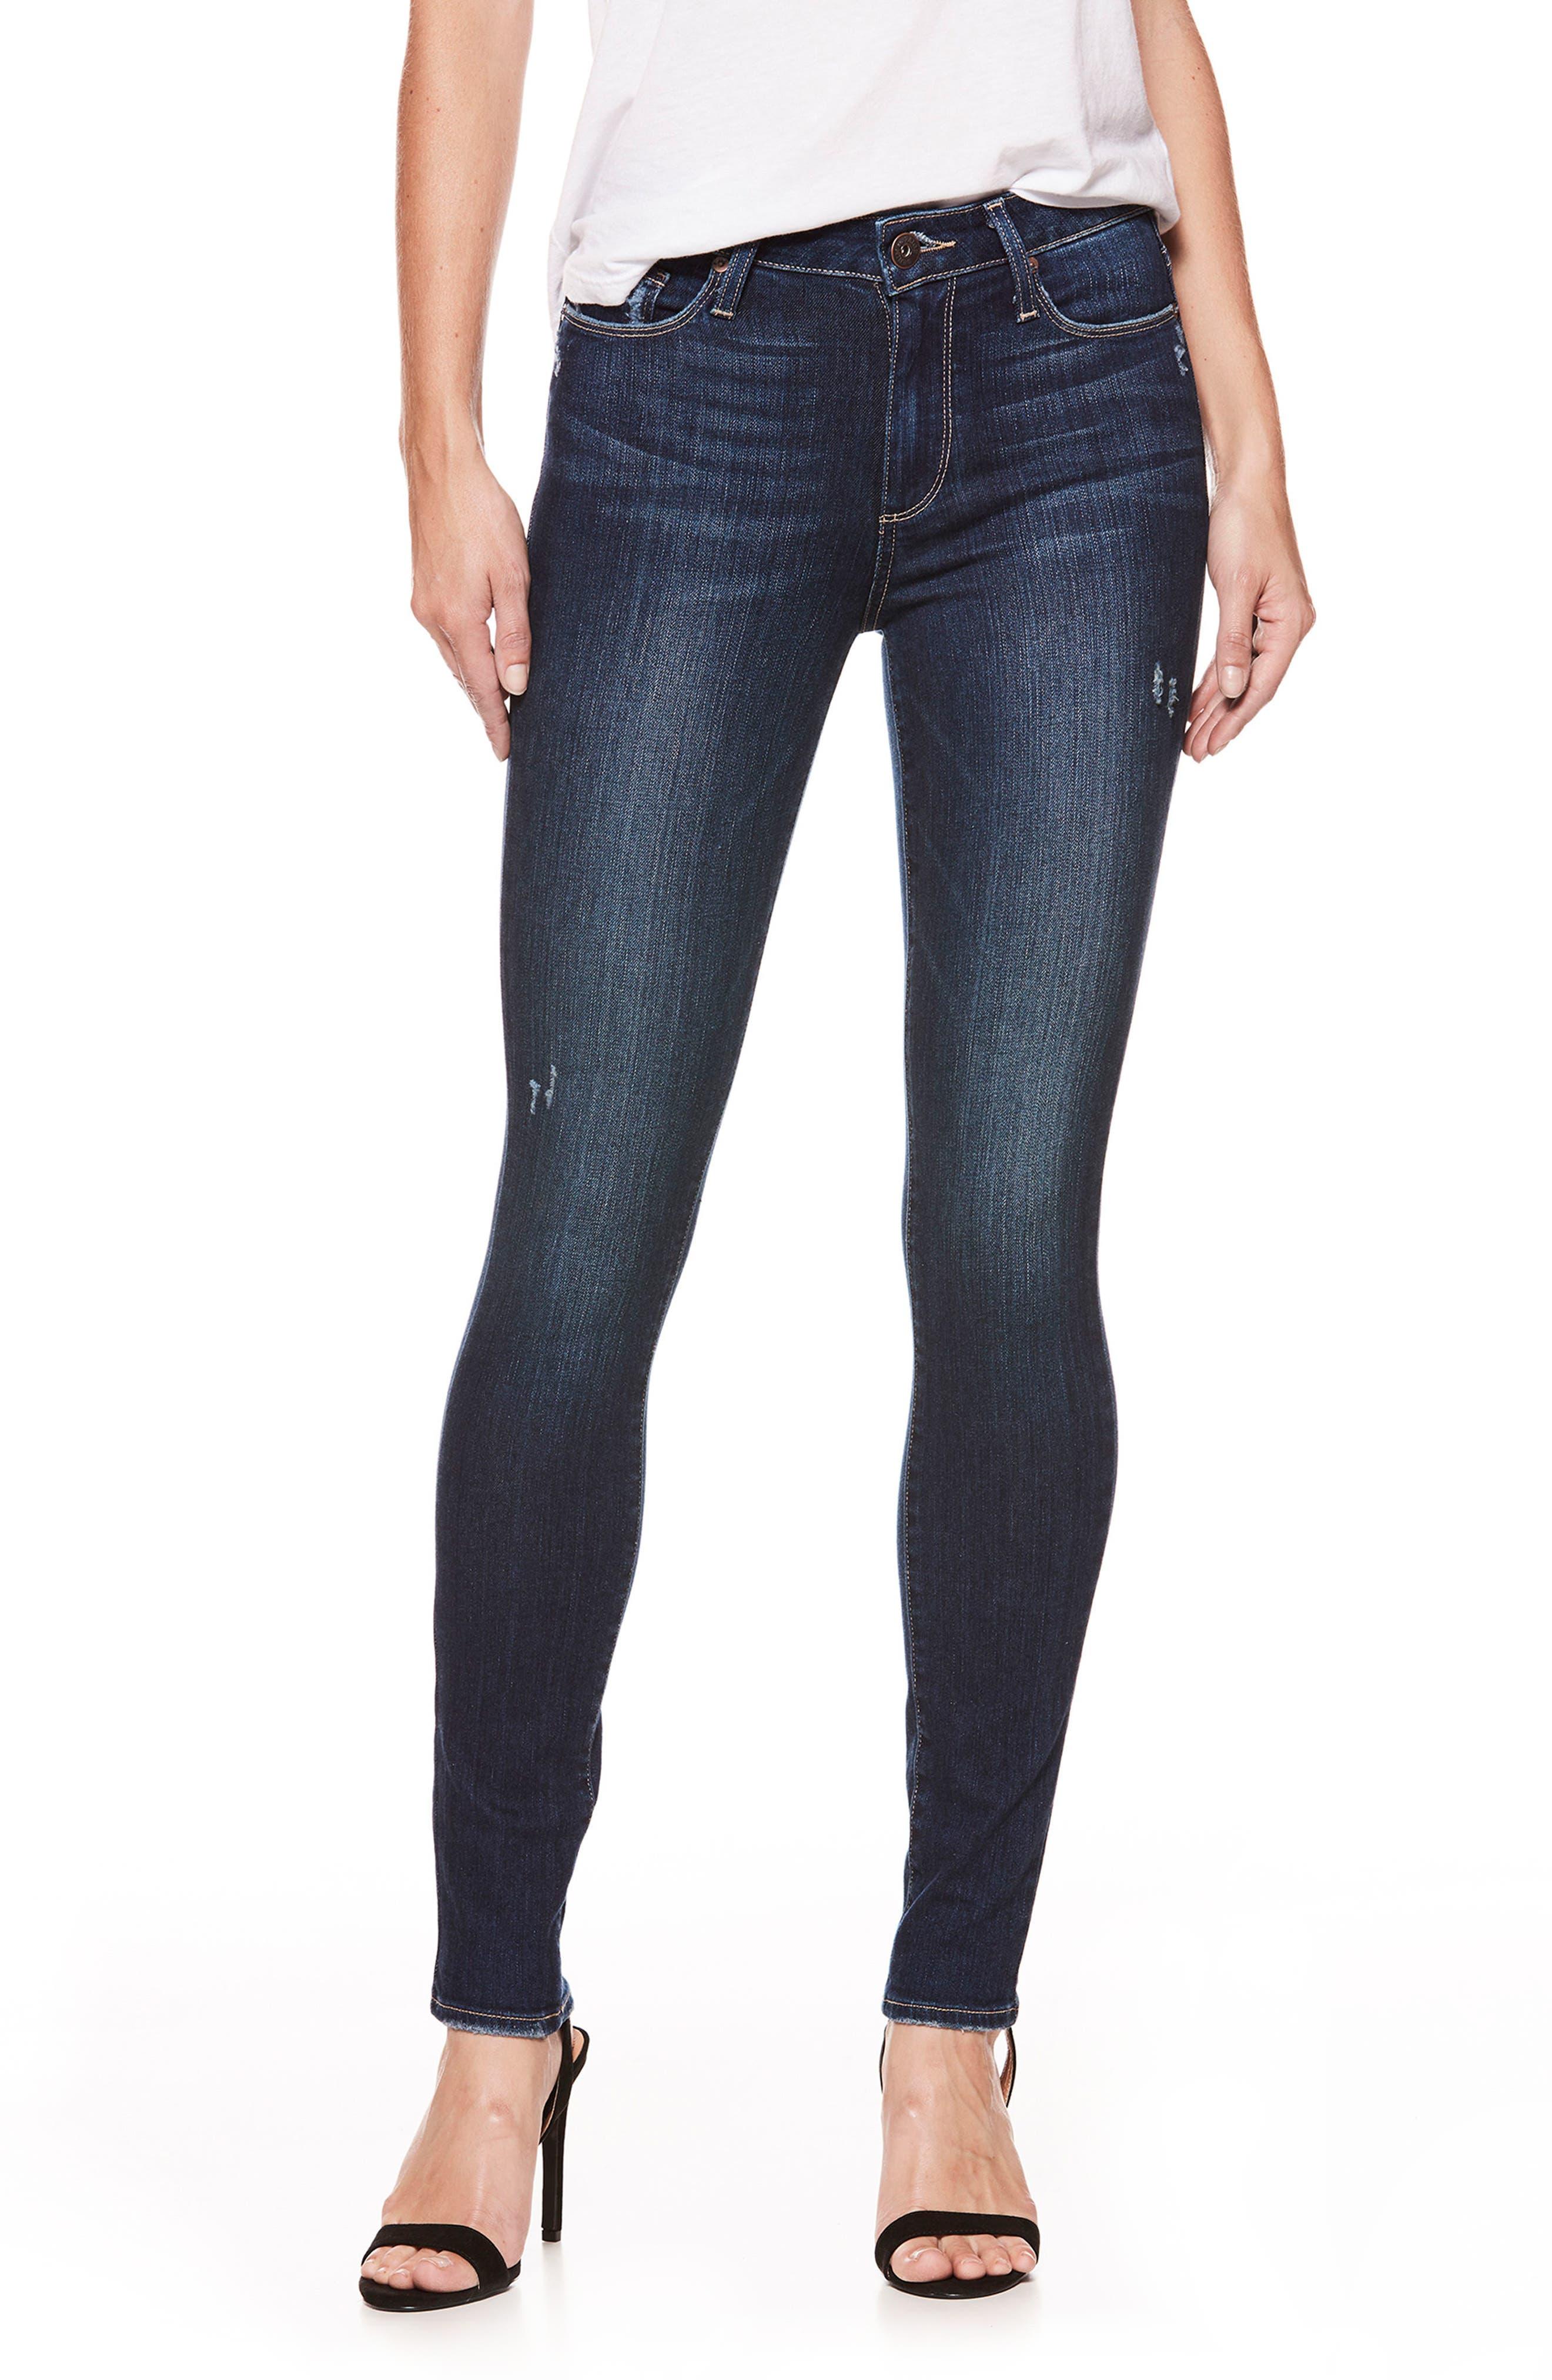 Hoxton High Waist Skinny Jeans,                         Main,                         color, Marina